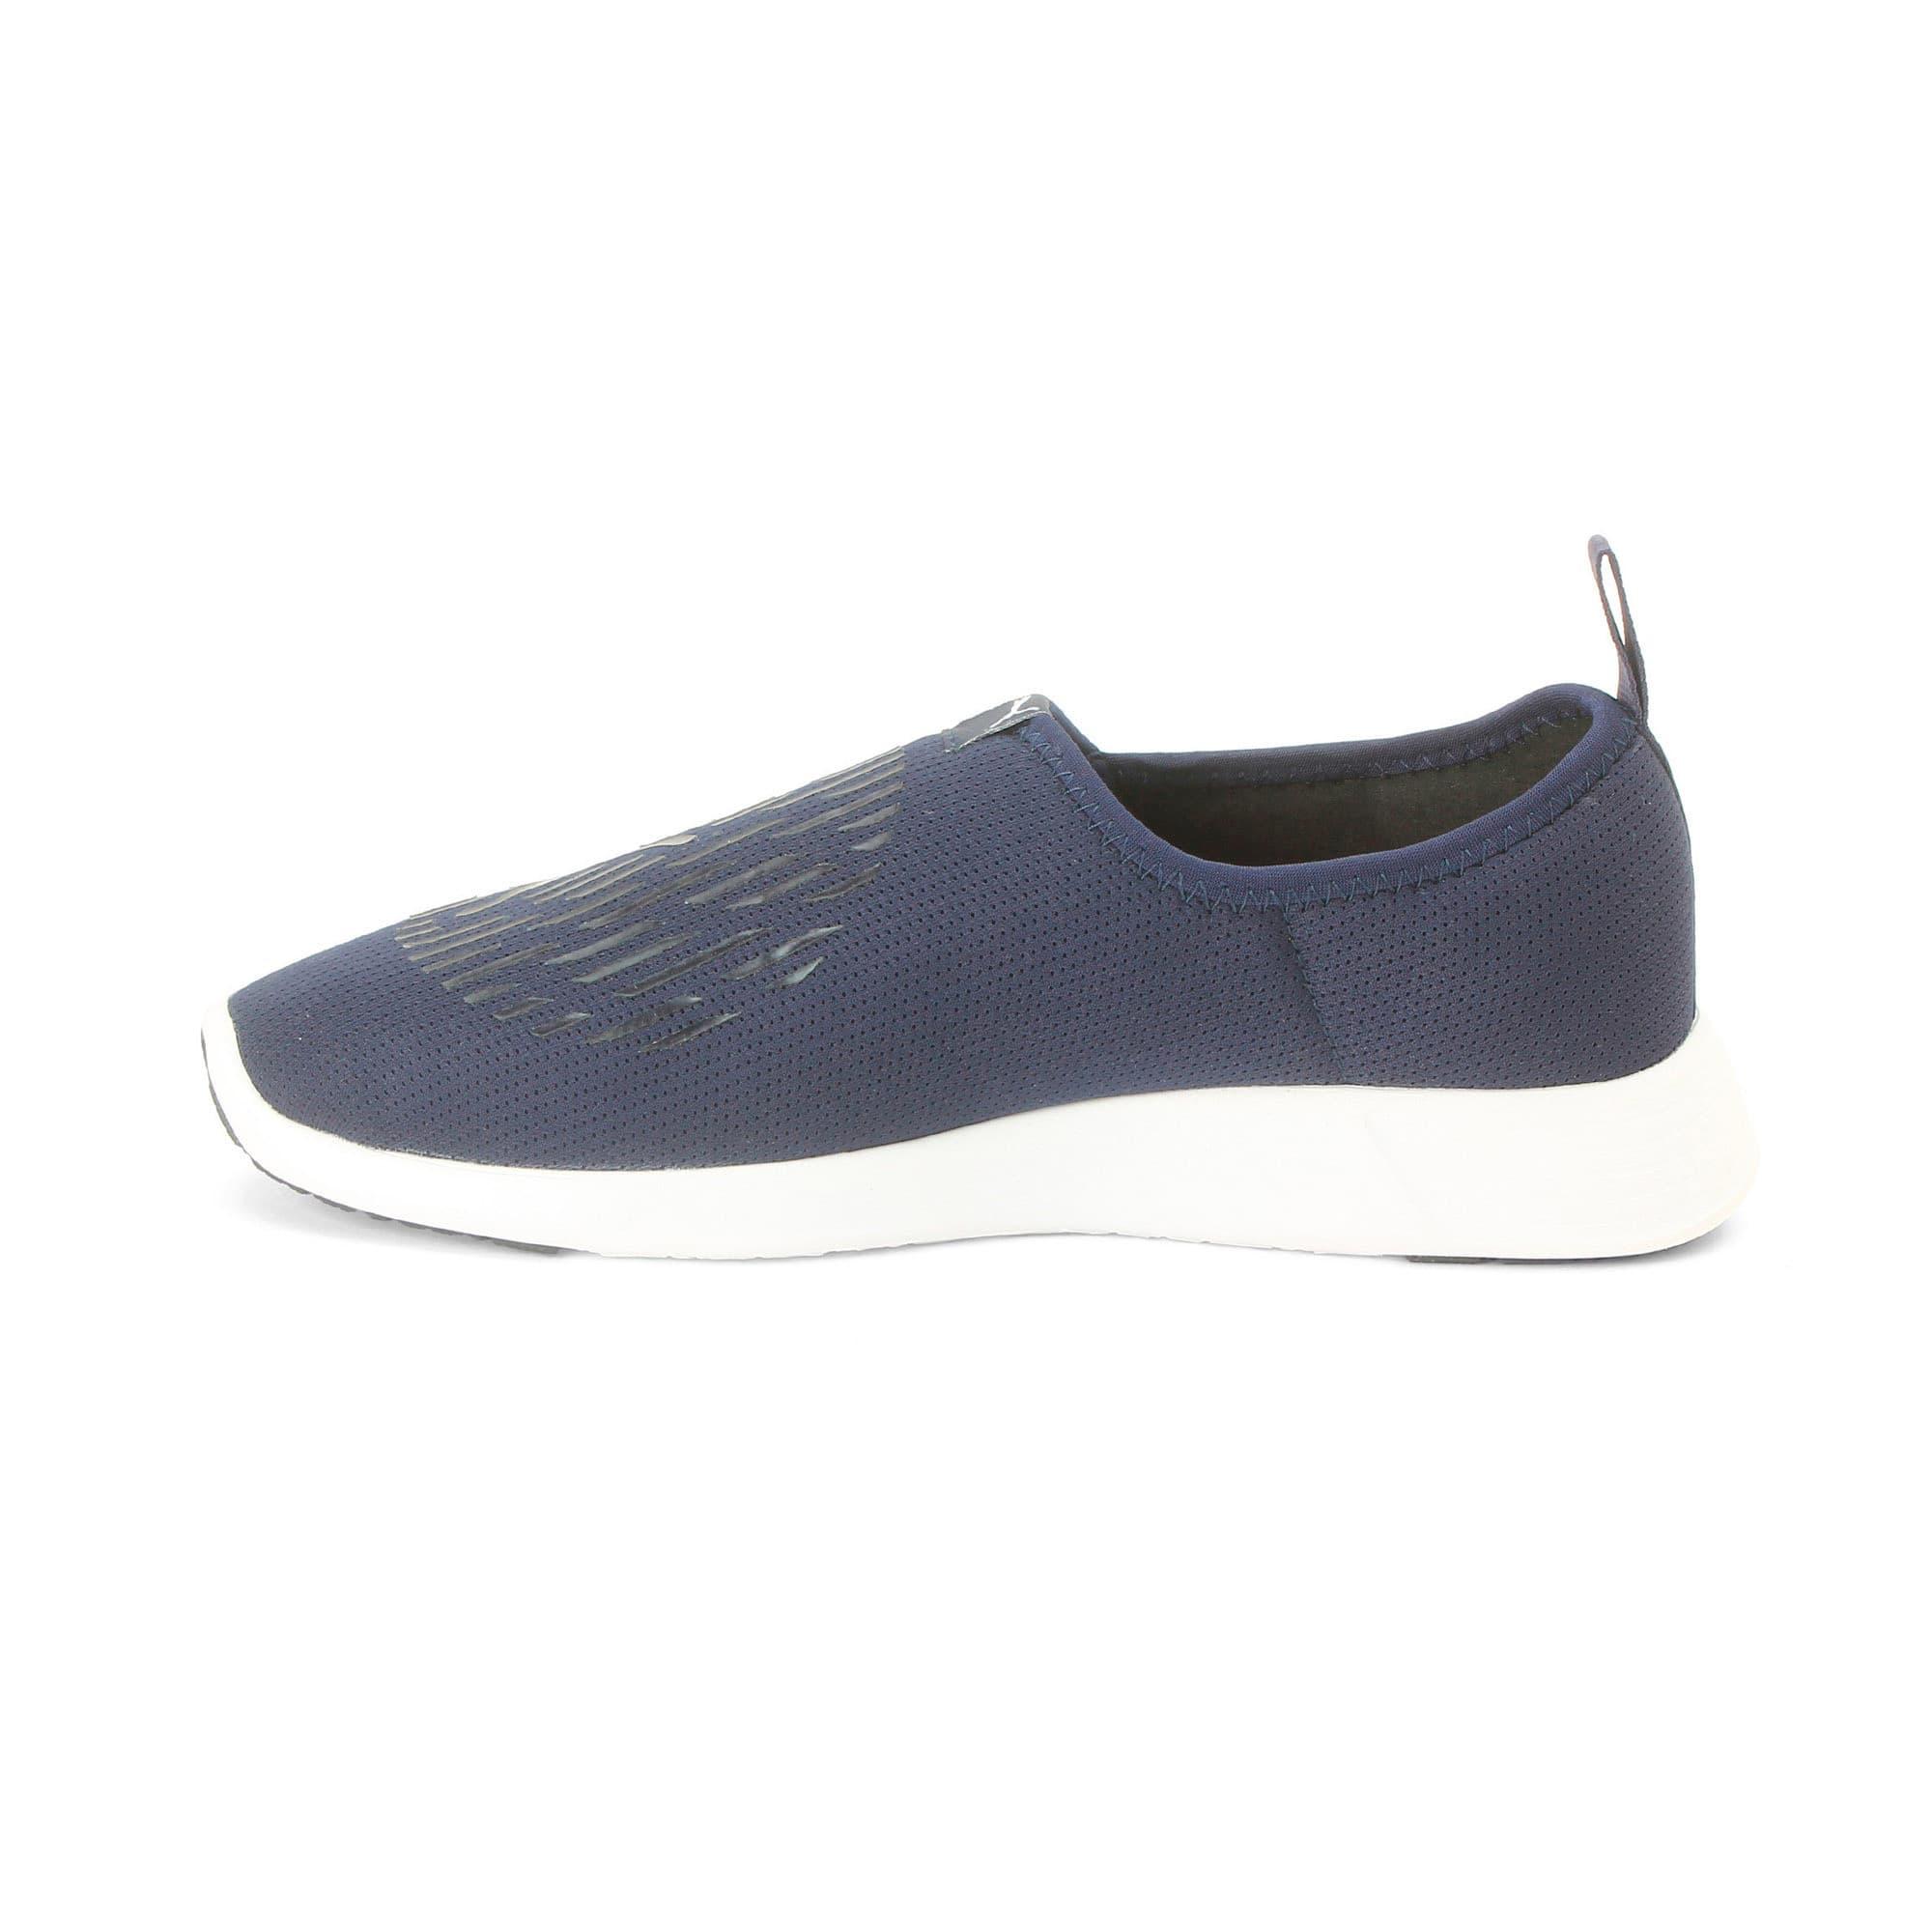 Thumbnail 1 of ST Comfort IDP Men's Sportstyle Shoes, Peacoat-Puma White, medium-IND